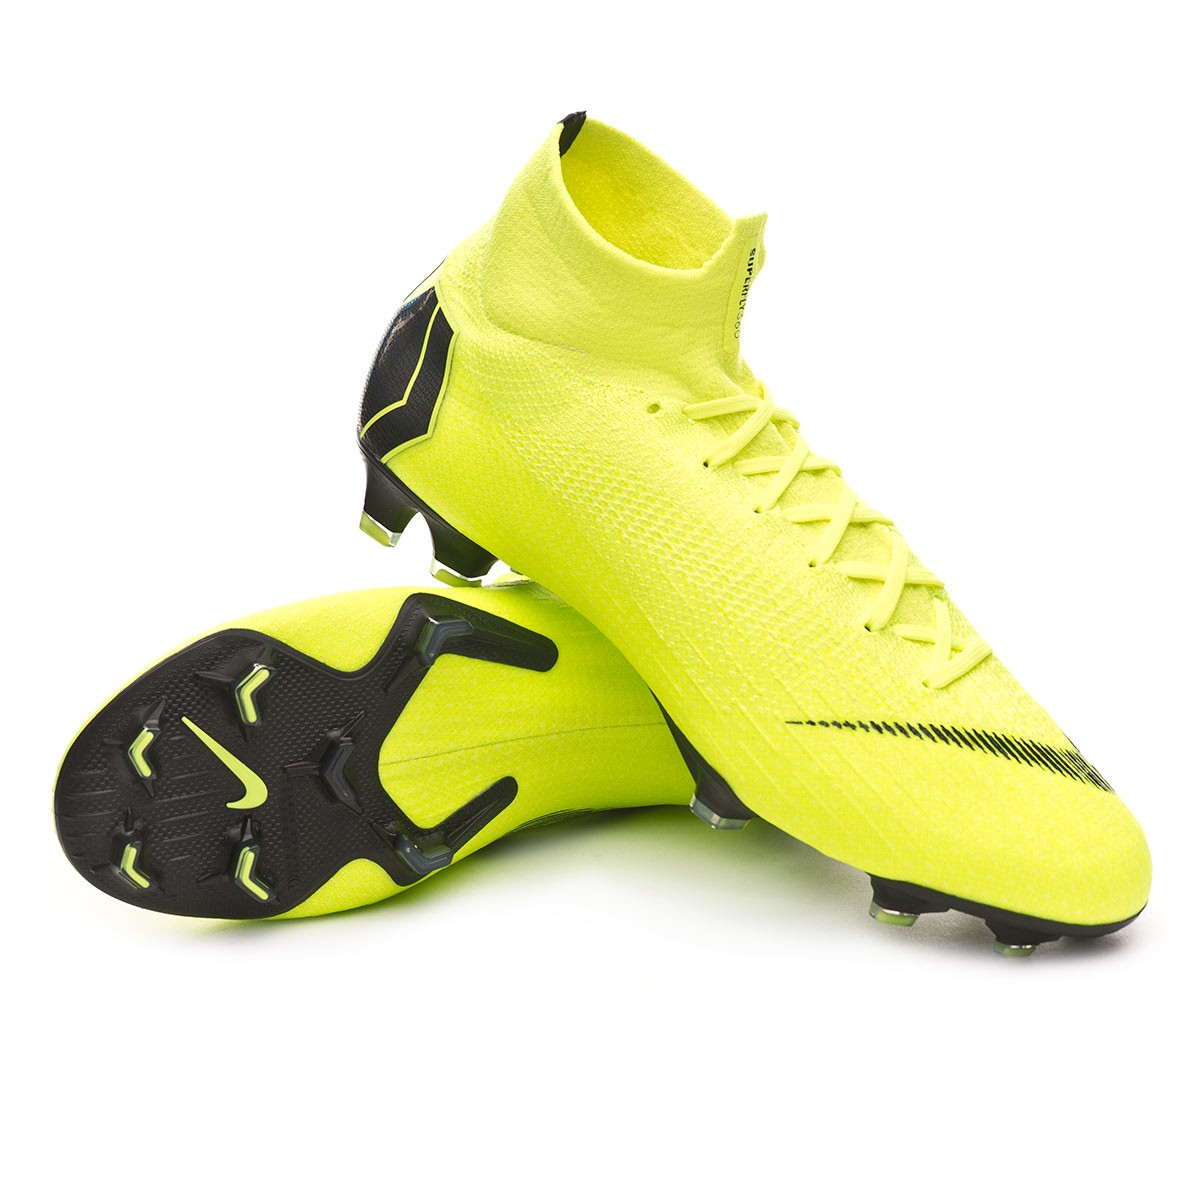 online store 4d918 4cbfd Nike Mercurial Superfly VI Elite FG Football Boots